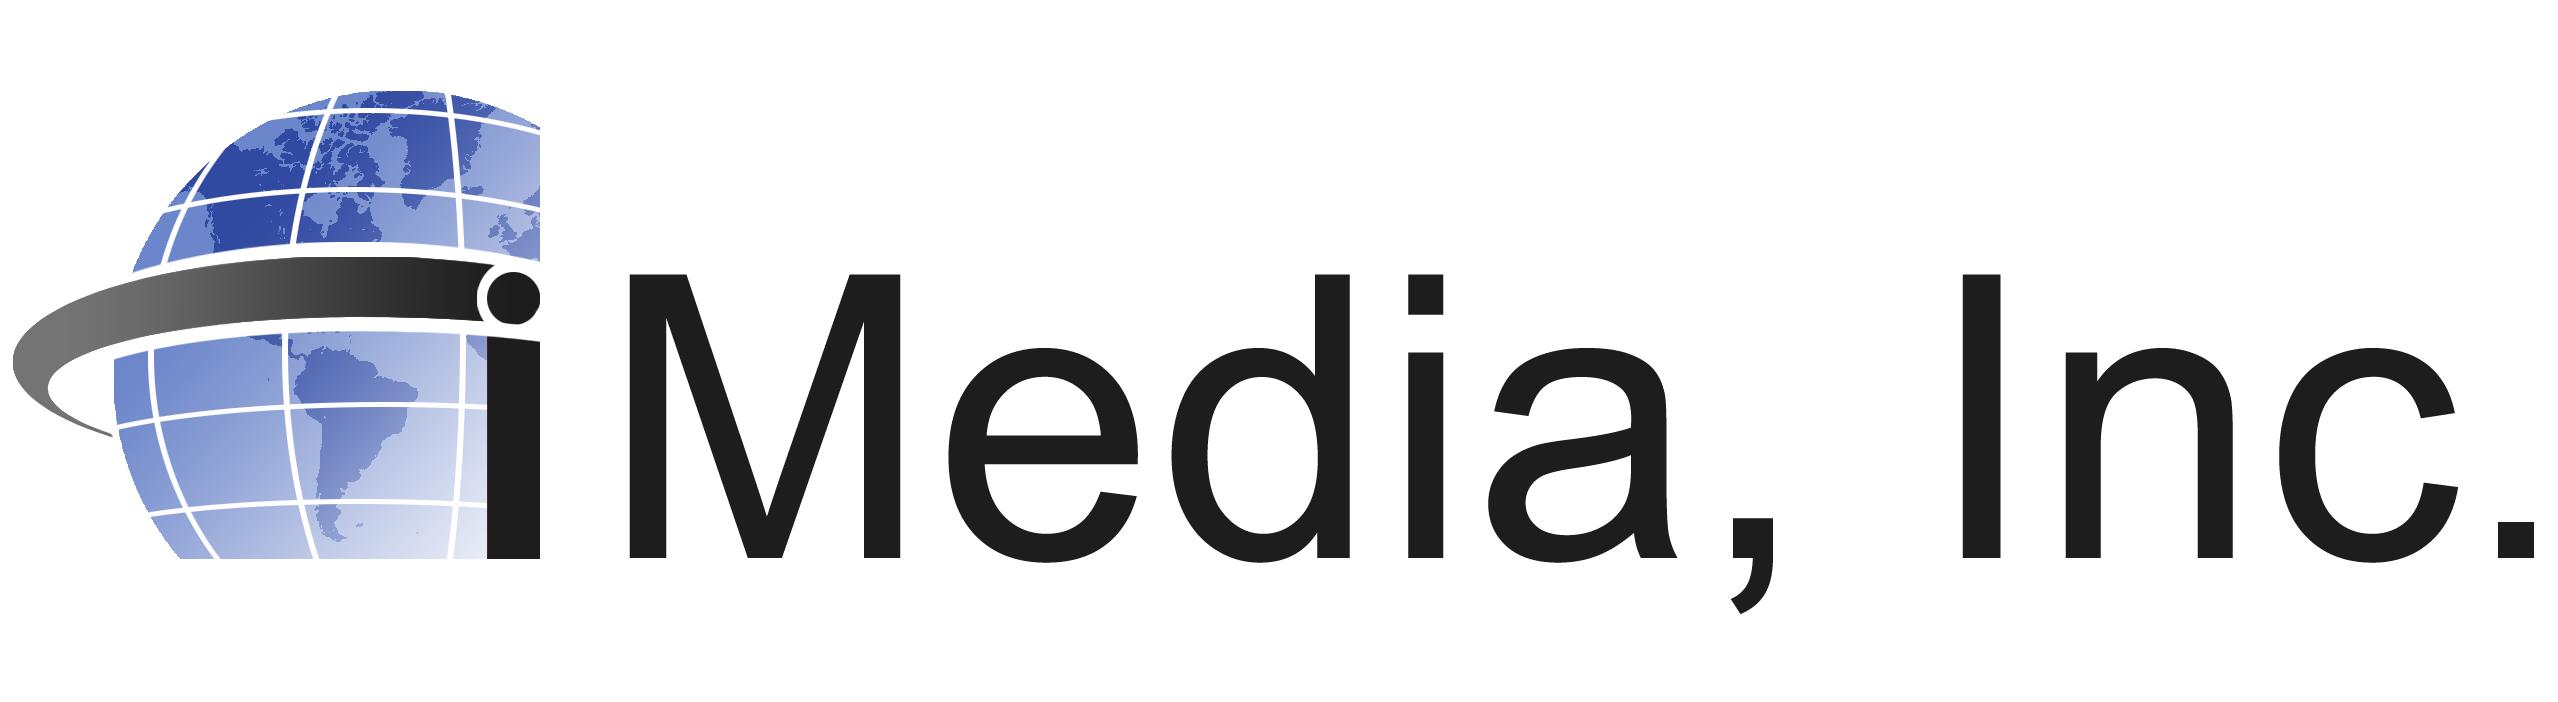 iMedia, Inc